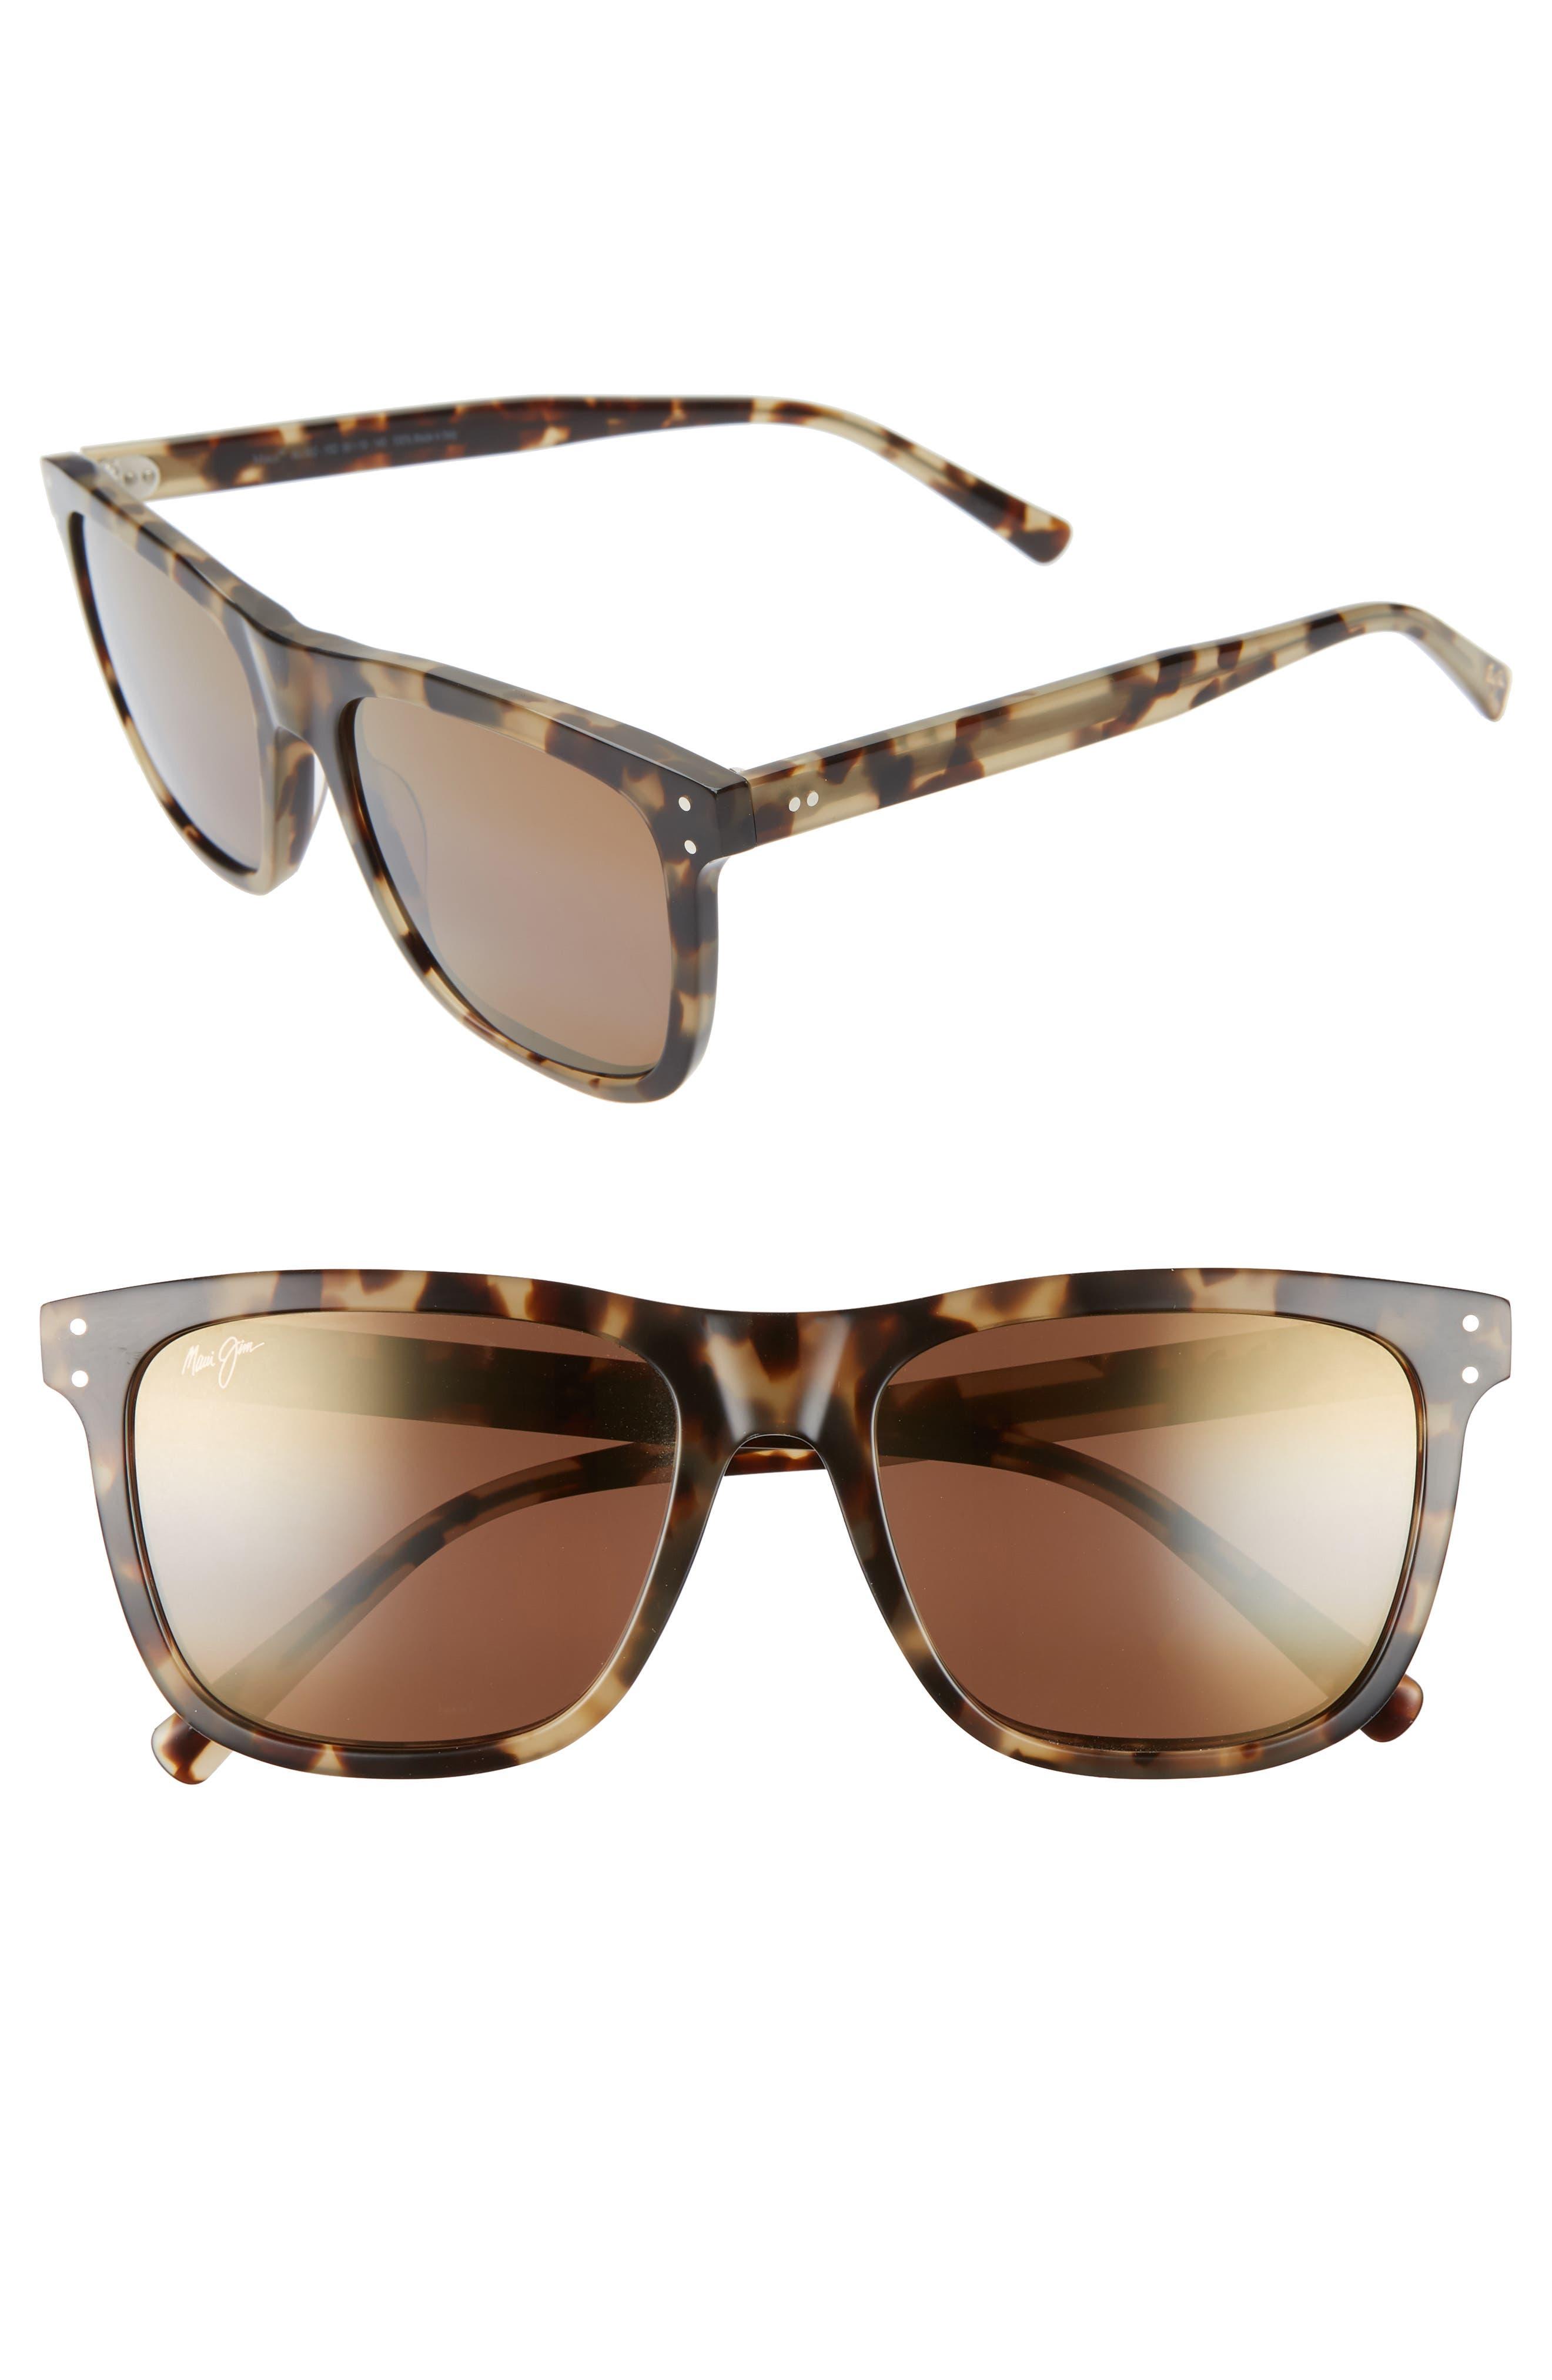 Velzyland 56mm Polarizedplus2 Square Sunglasses